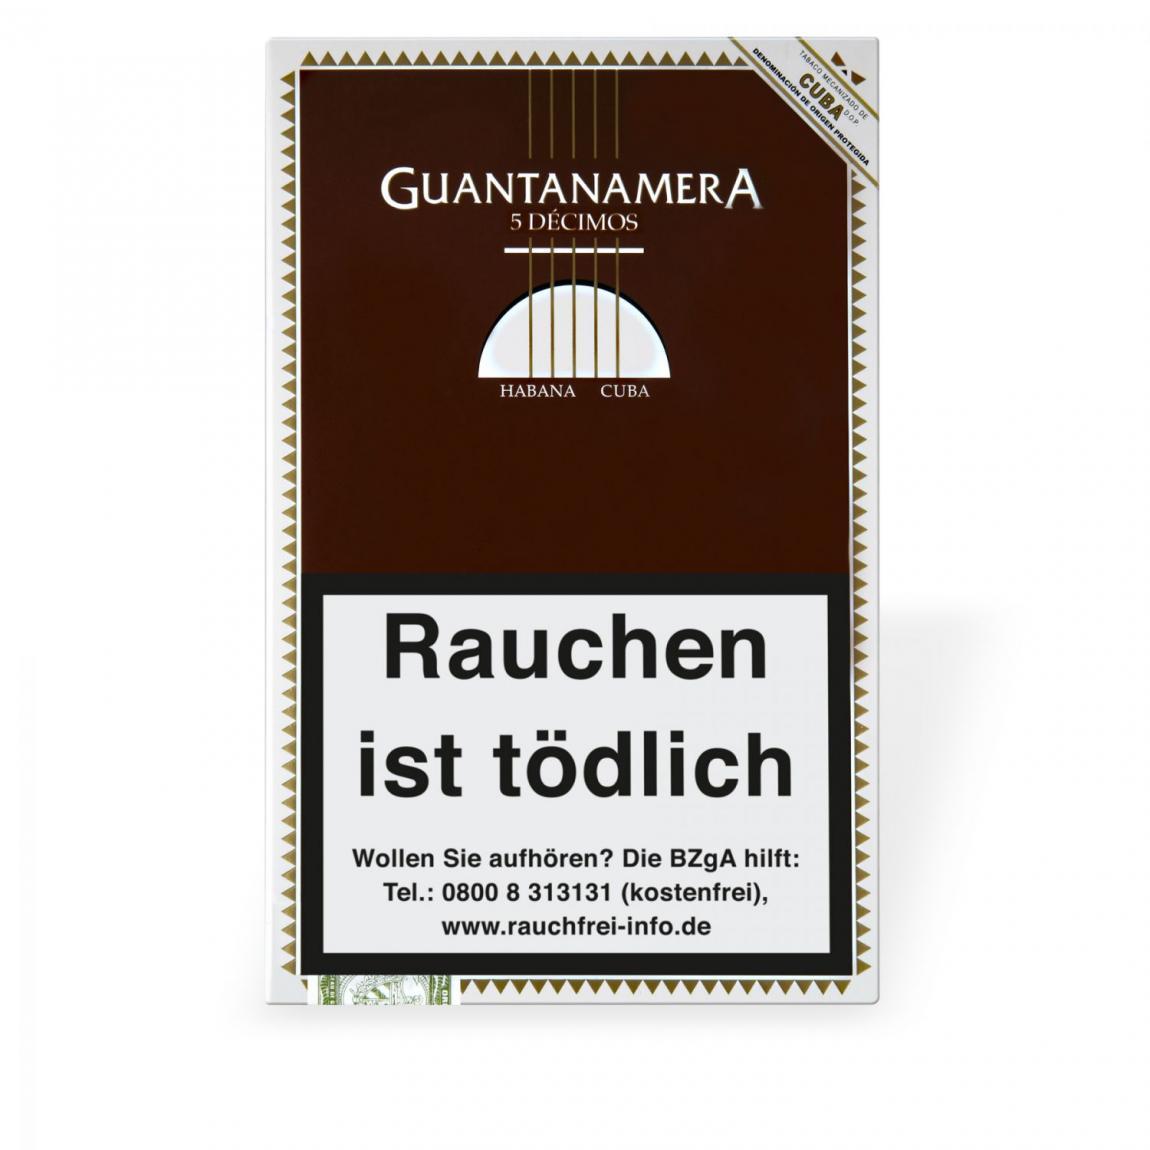 Guantanamera Decimos 5er Schachtel